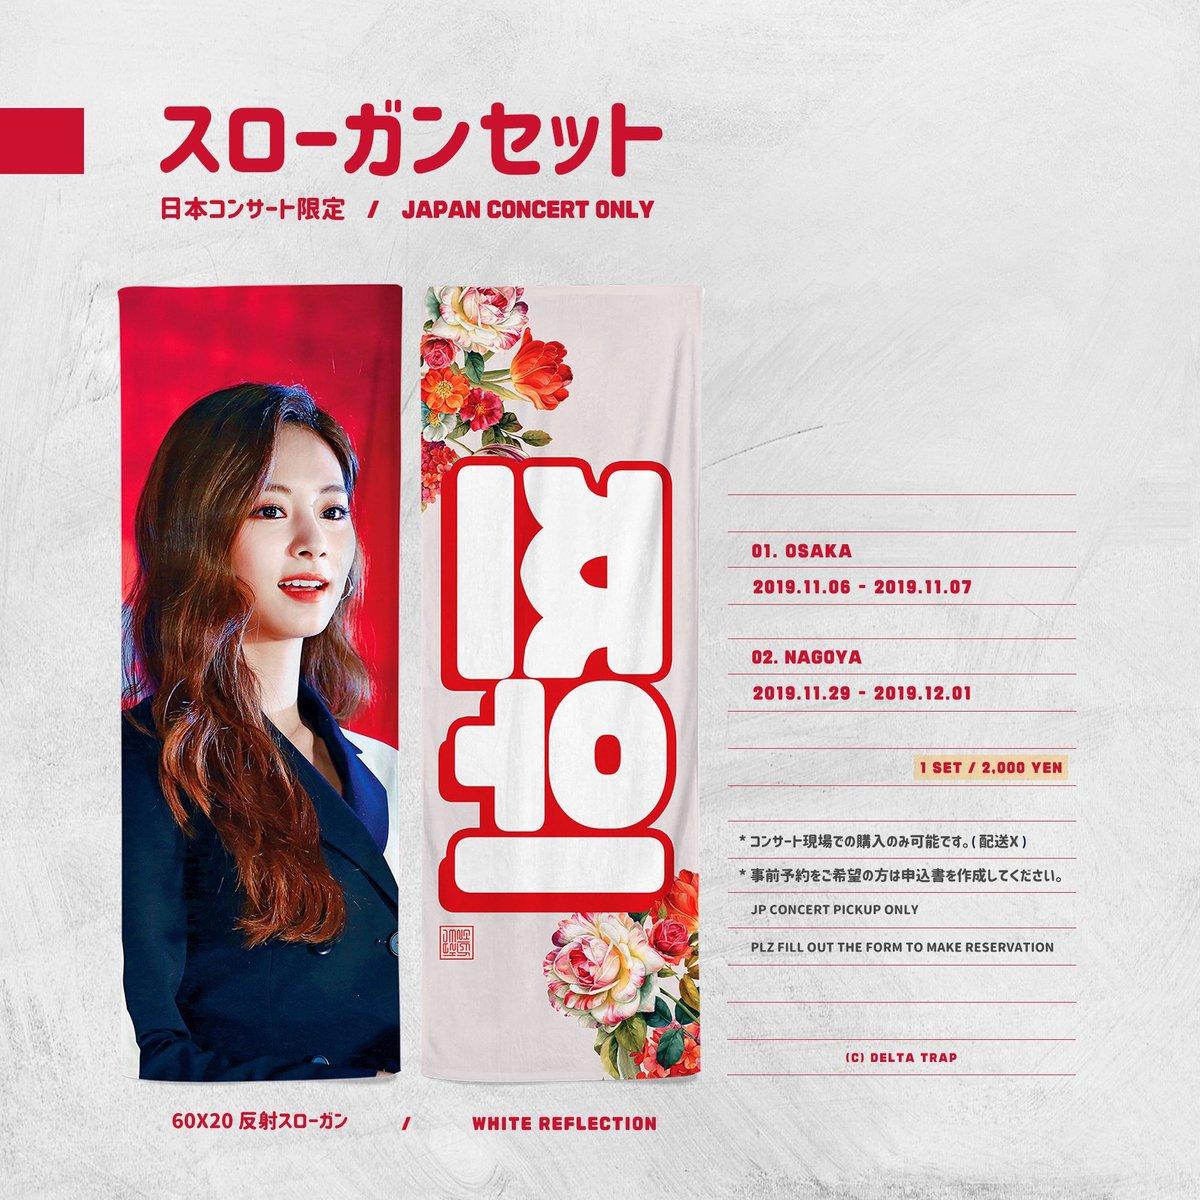 TWICE ツウィ@delta_trap 様 日本コンサート限定スローガン 日本グループオーダーになります。 締め切り 11月30日 お申込み、詳細はフォームからよろしくお願いします。https://docs.google.com/forms/d/e/1FAIpQLScZM32Geiv1spA3zXvQo0ye2GyCDFG0a14pWzZGrKkpX2Nytw/viewform…